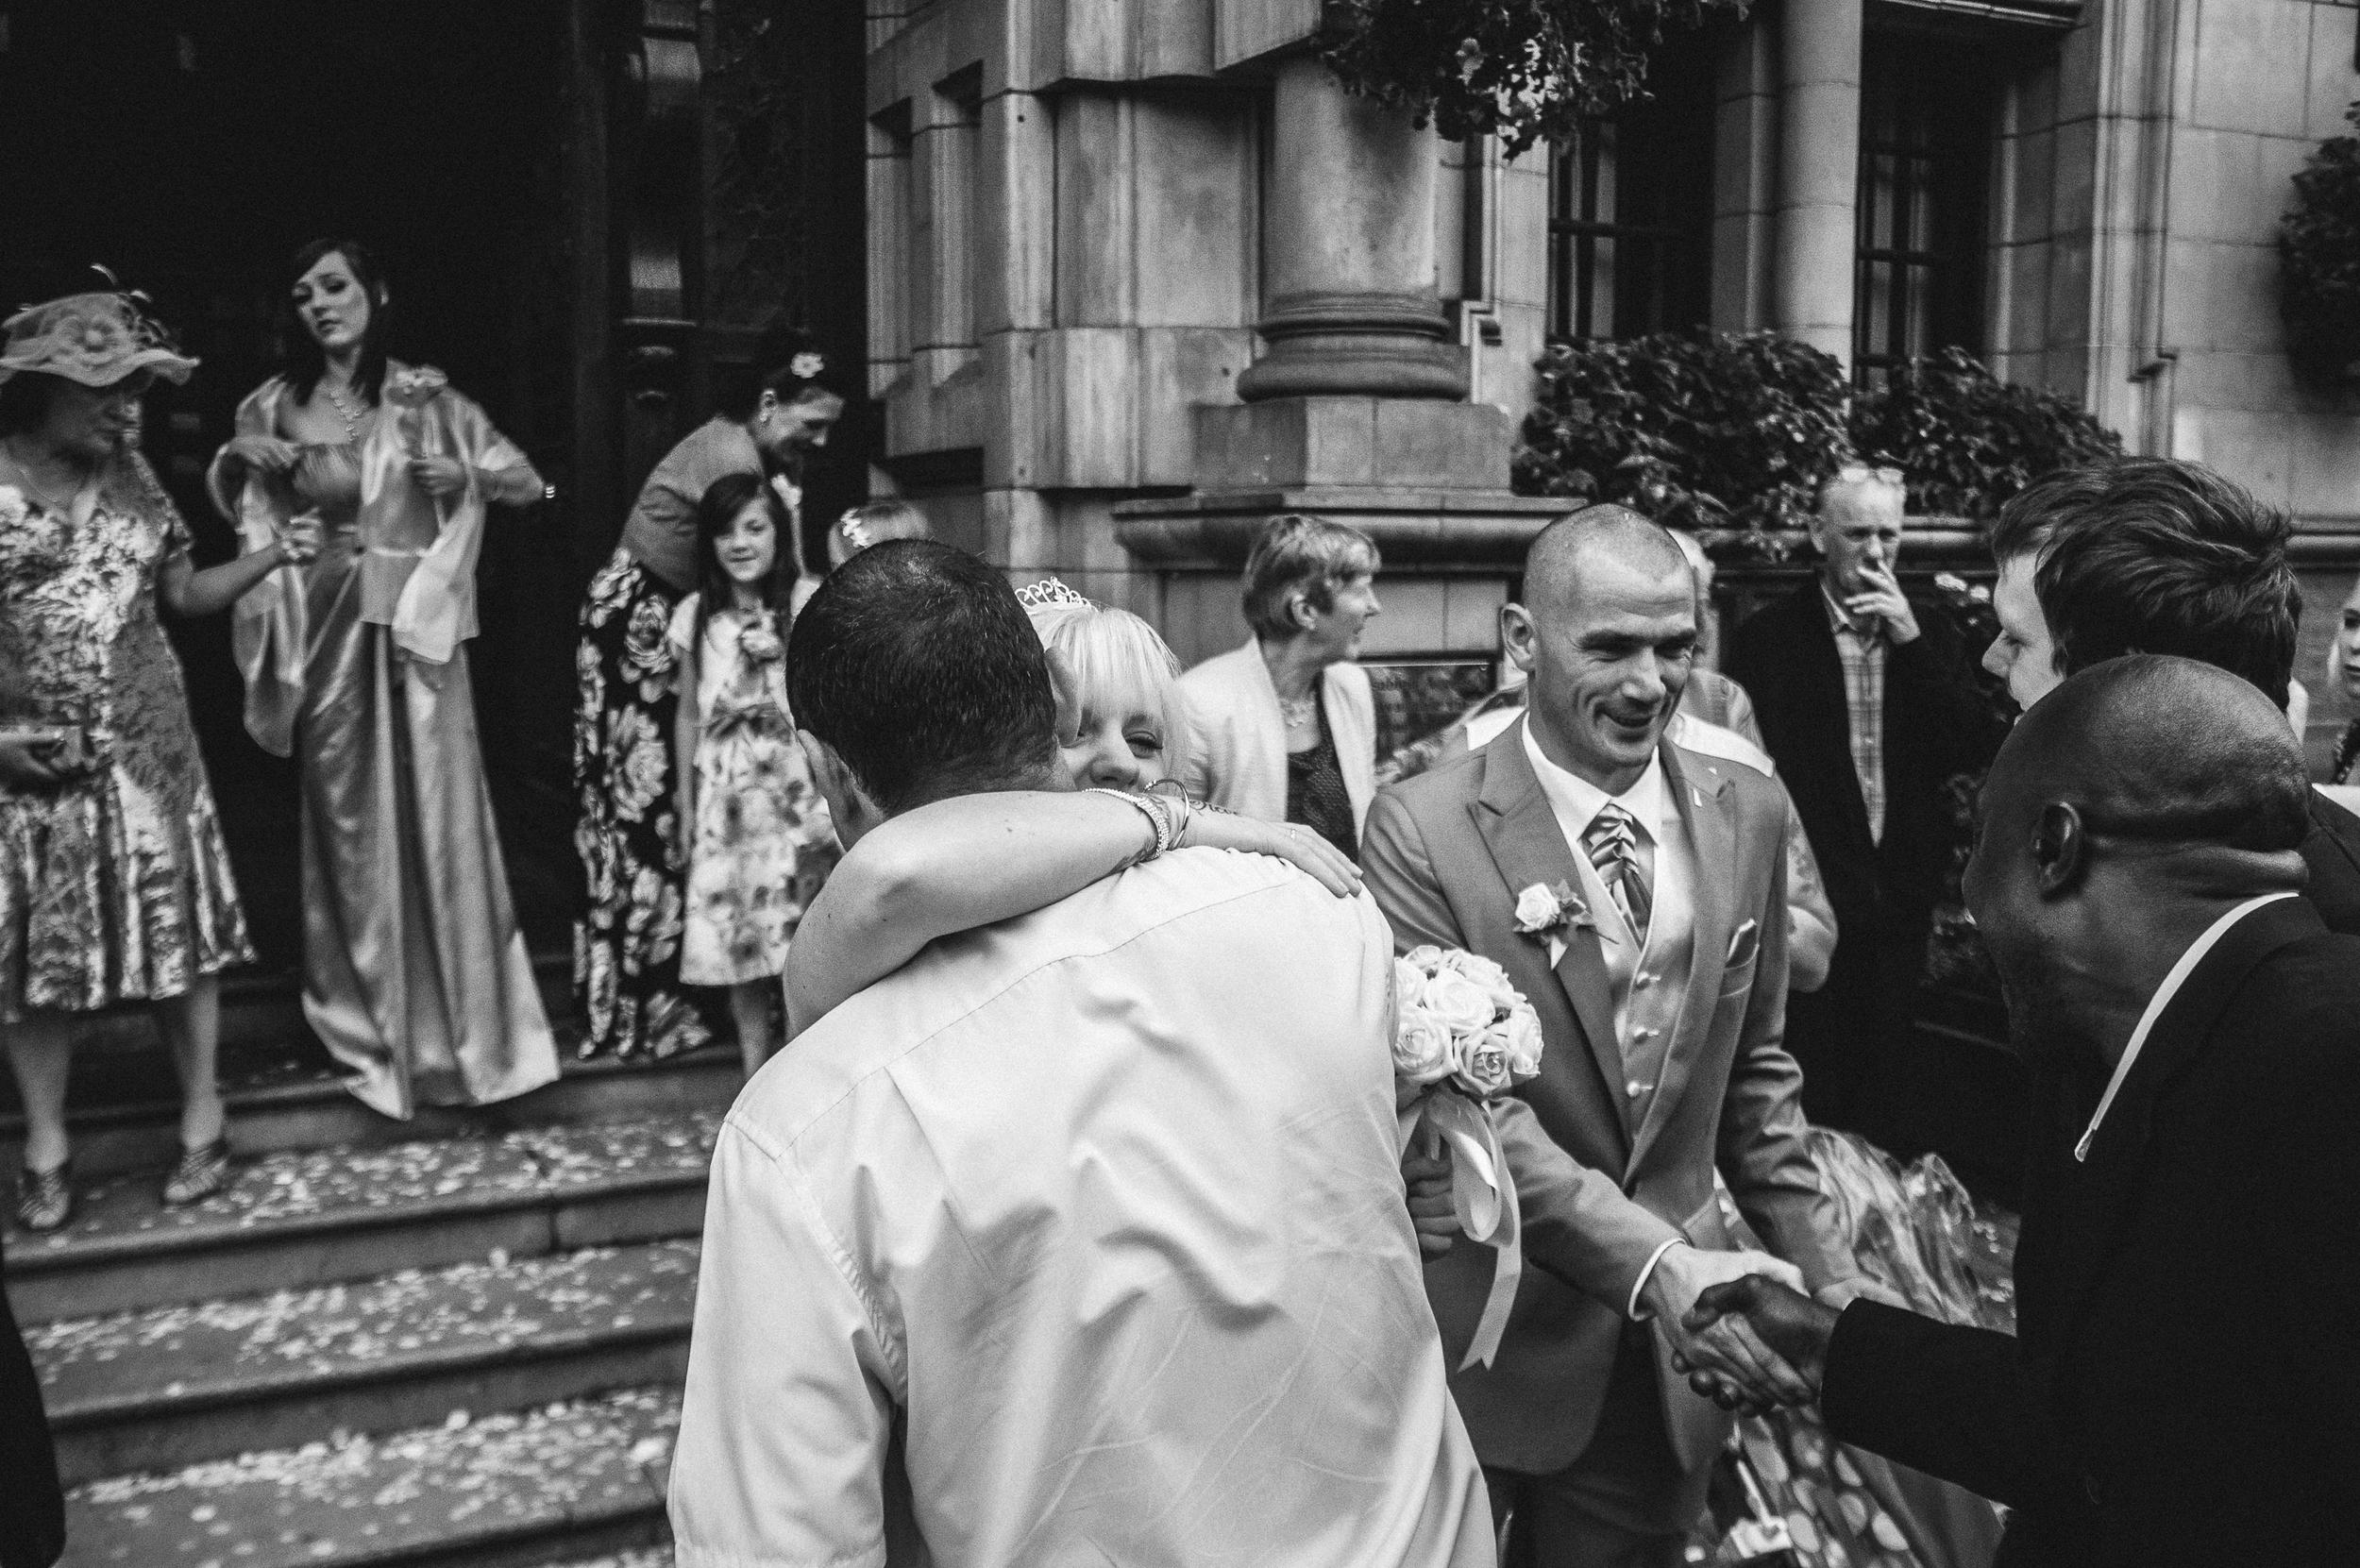 My second wedding.  Nikon D90 | 18-50mm | F2.8 - 1/4000th - iso800